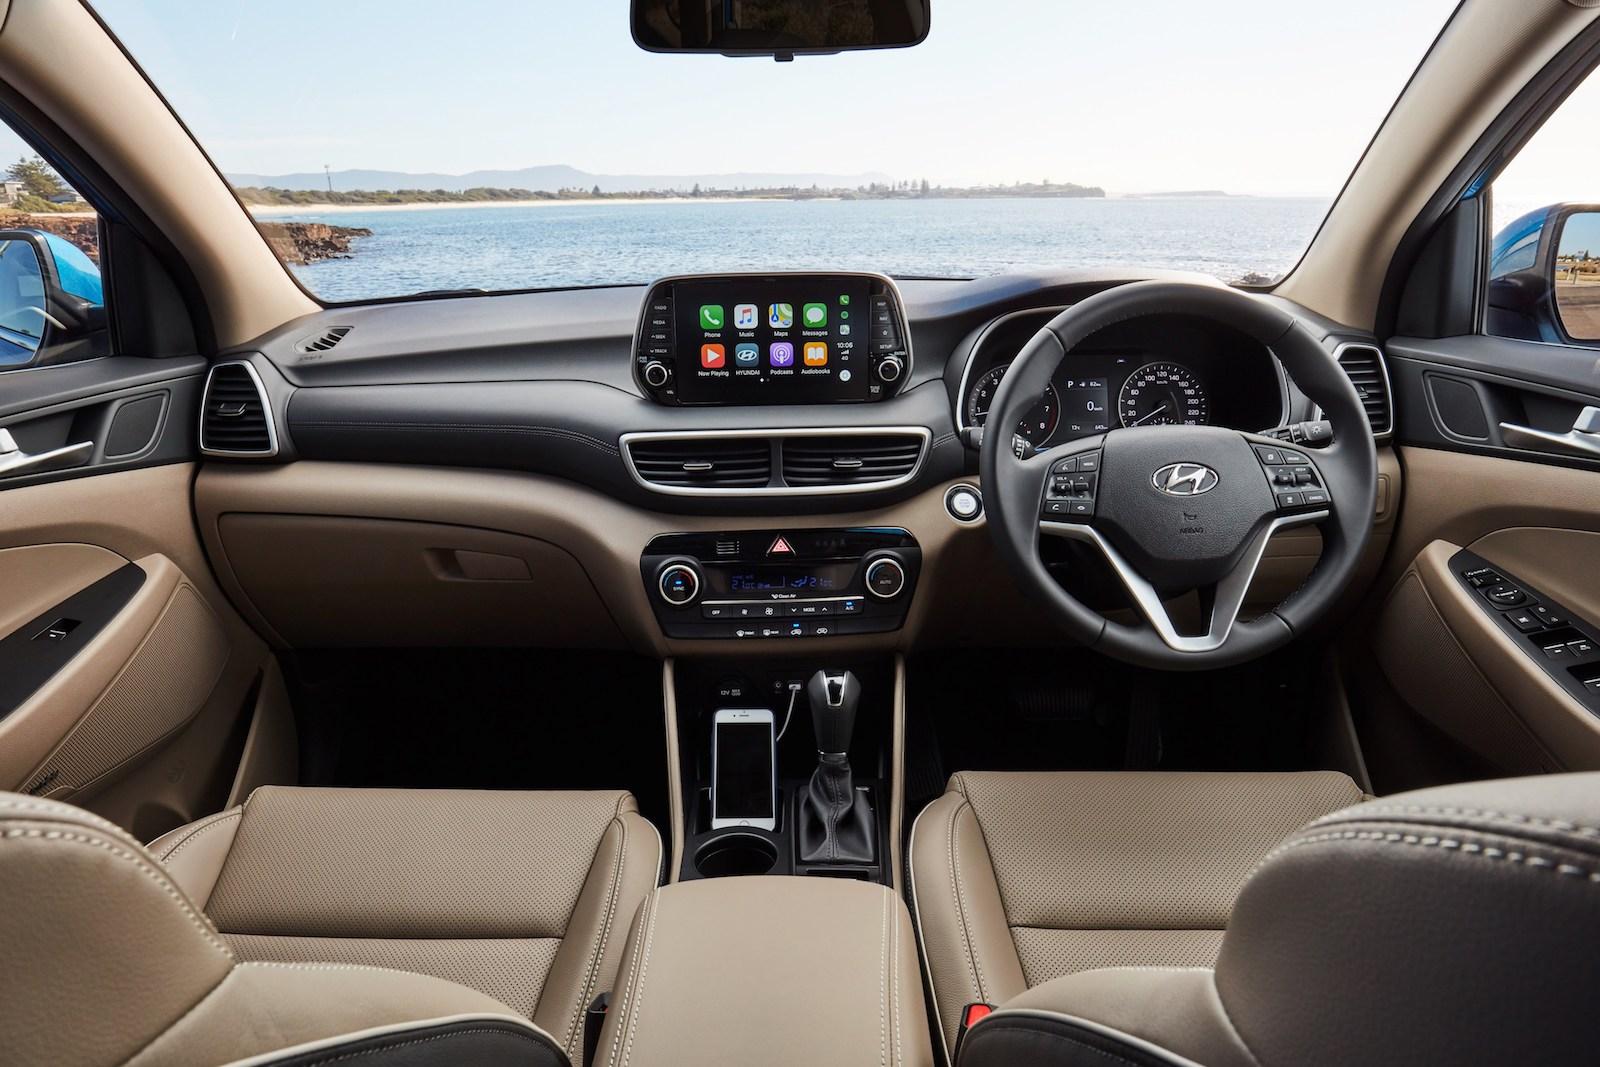 2019 hyundai tucson now on sale in australia from 28 150 performancedrive - Hyundai tucson interior ...